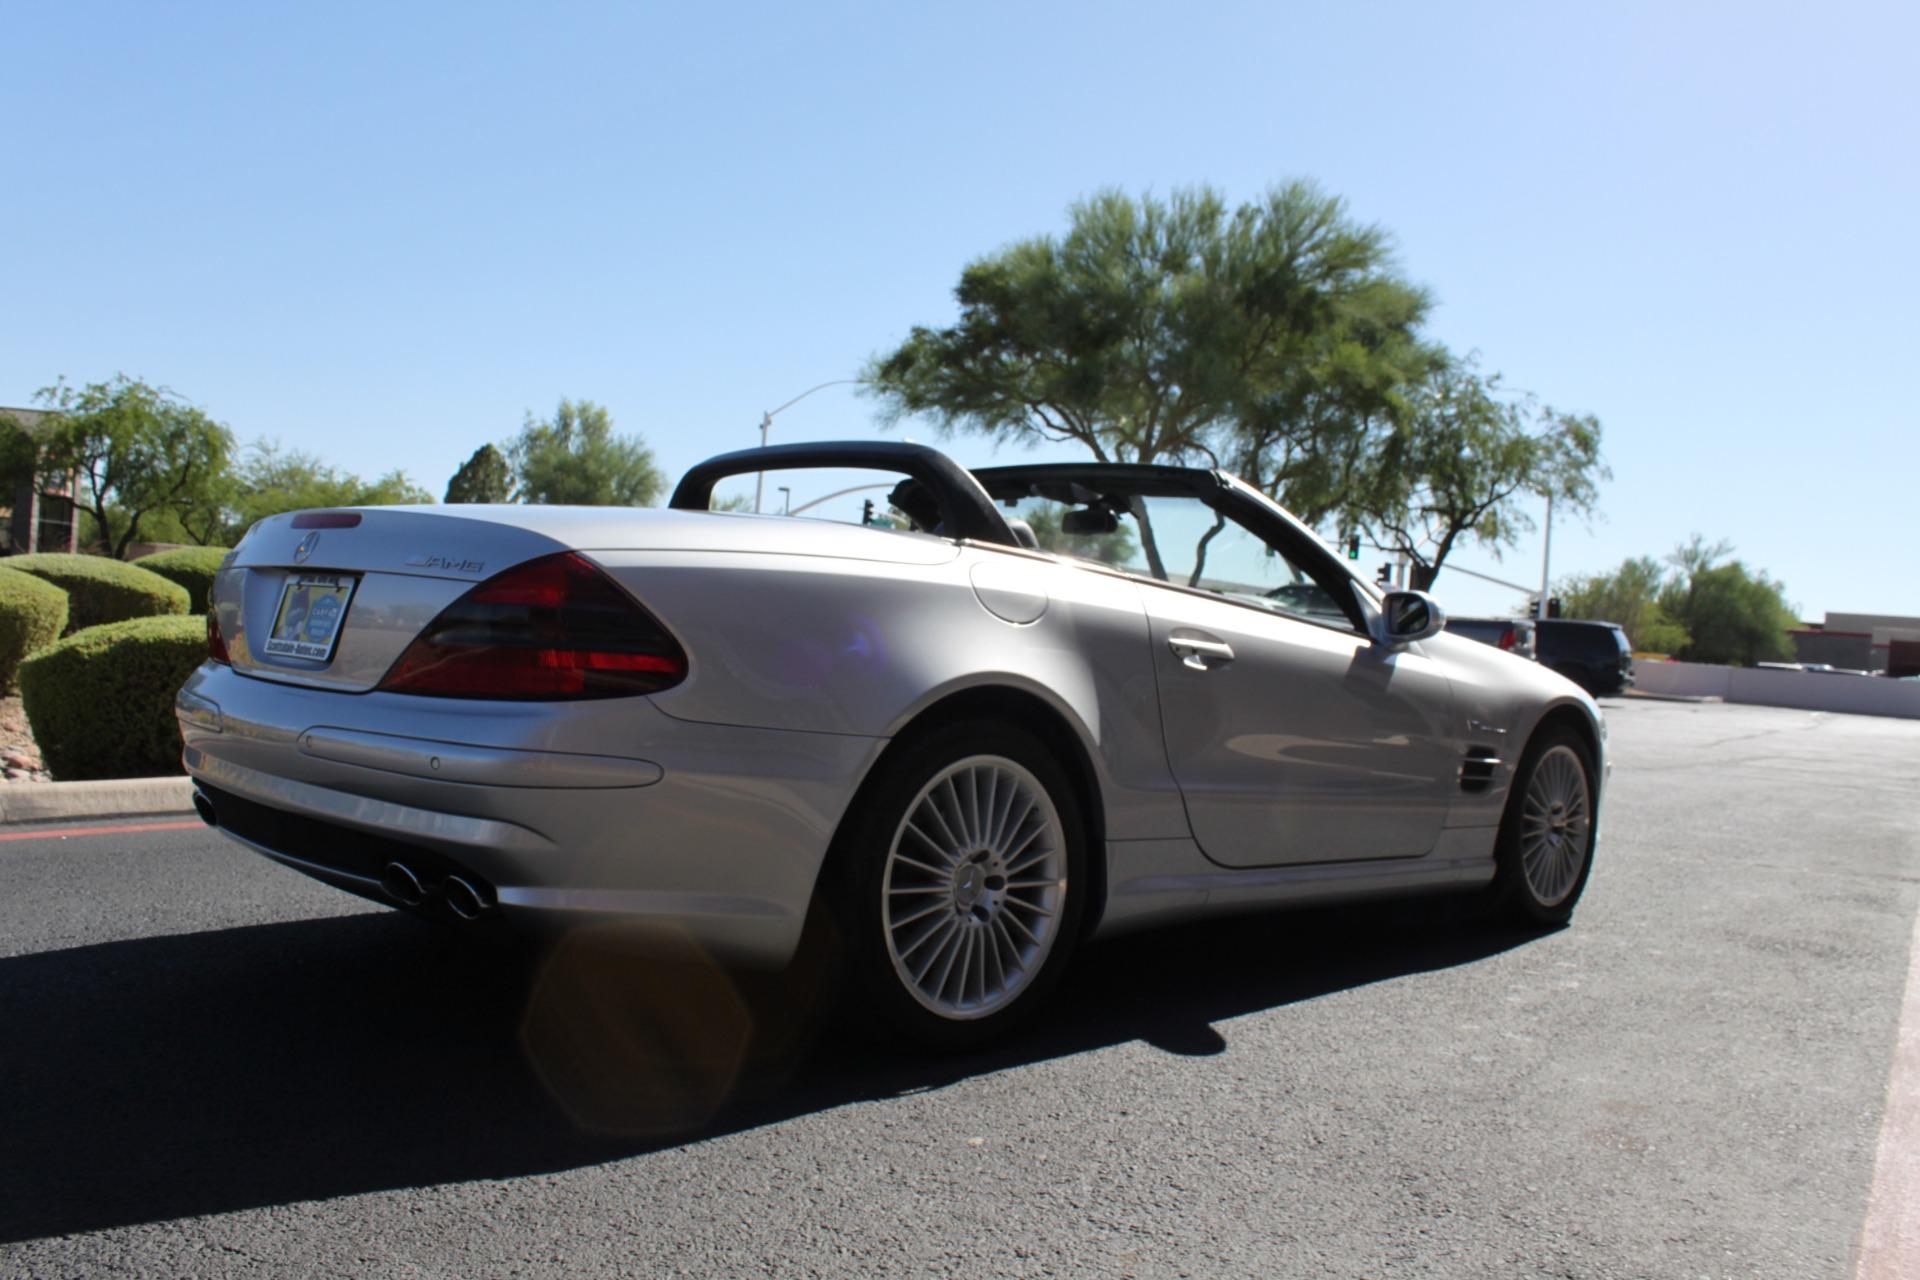 Used-2003-Mercedes-Benz-SL-Class-AMG-Lamborghini